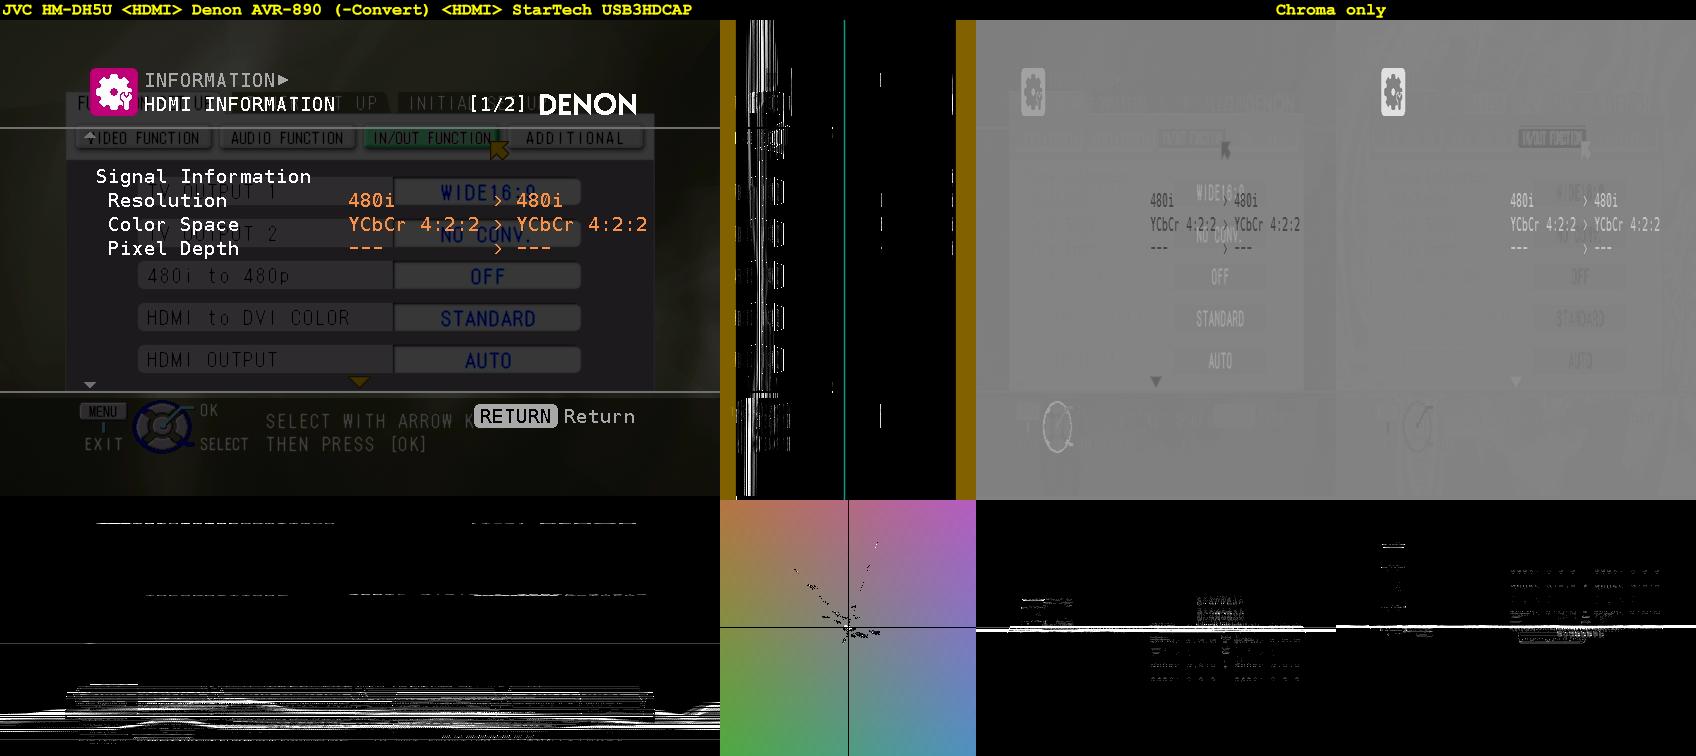 Click image for larger version  Name:Menu + Info - JVC HM-DH5U =HDMI= Denon AVR-890, -Convert =HDMI= StarTech USB3HDCAP.png Views:3862 Size:329.2 KB ID:35271